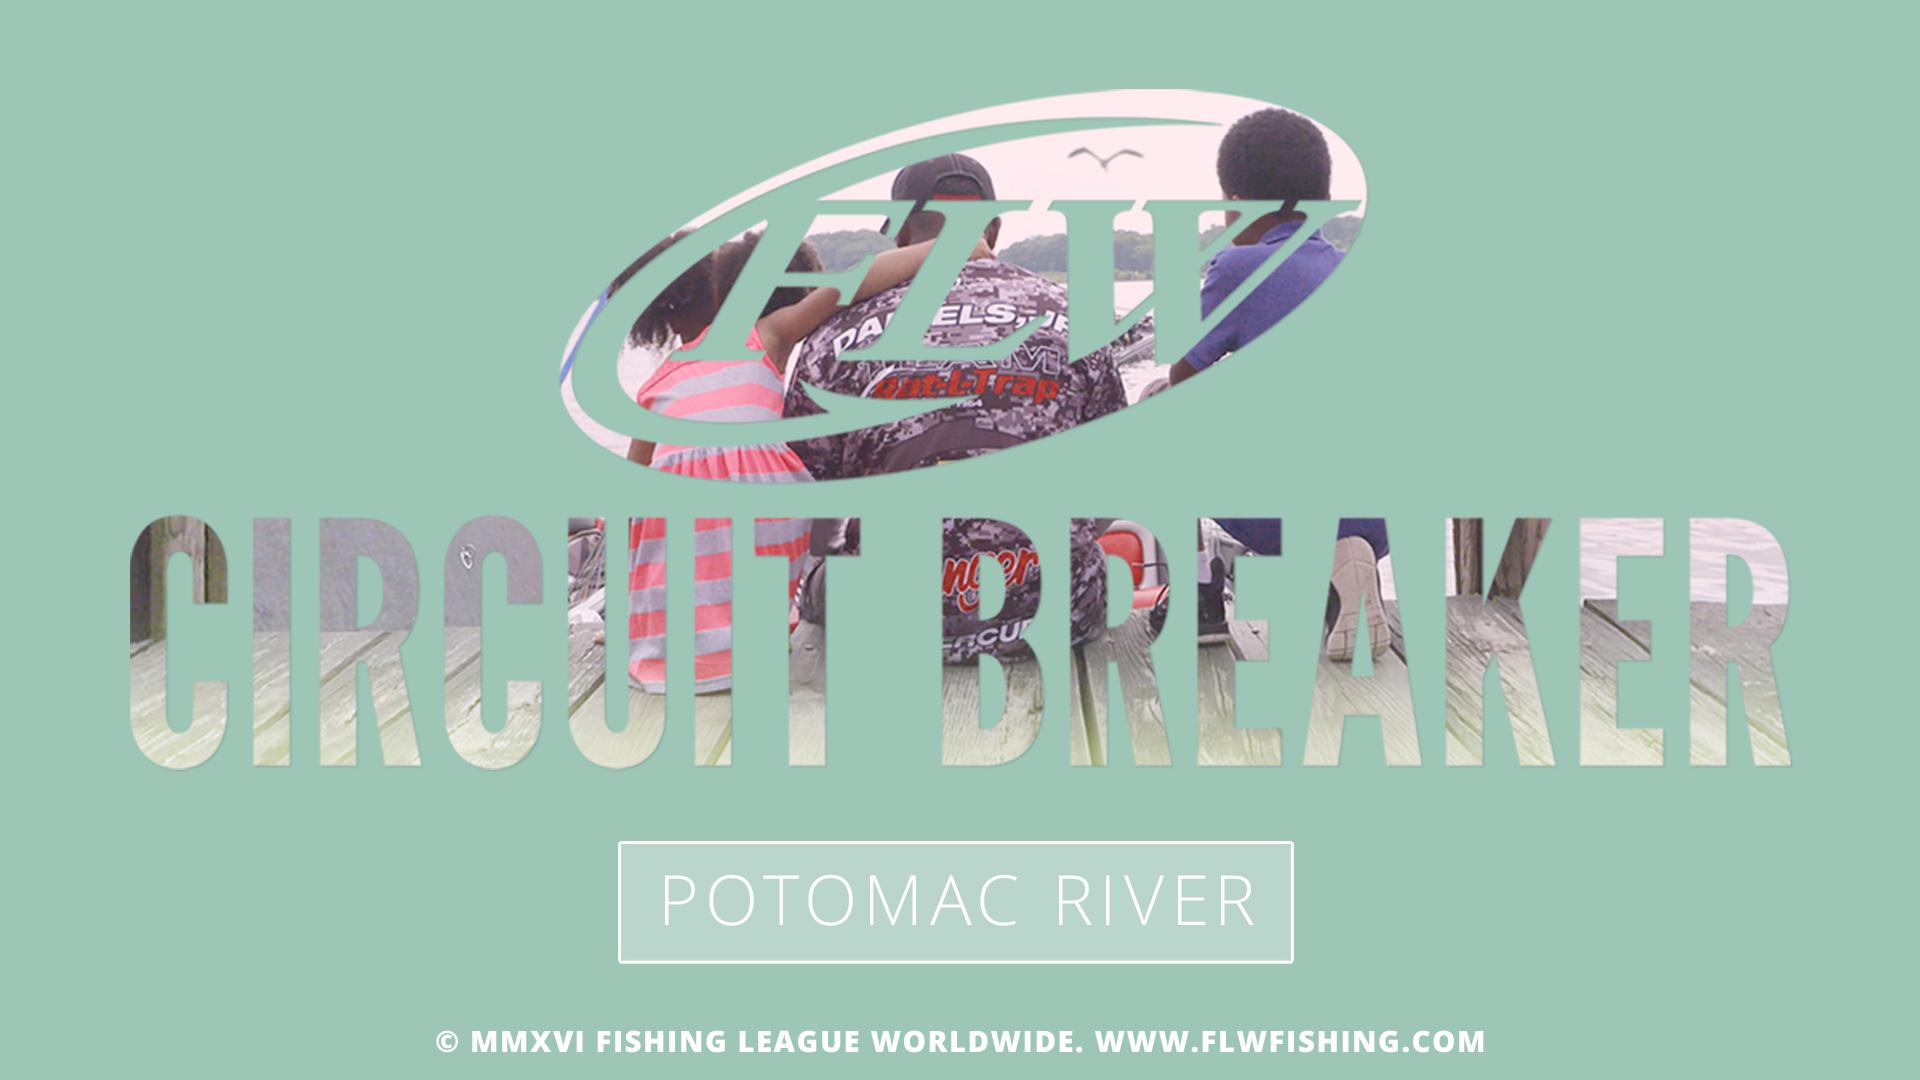 Circuit Breaker - S03E06 - Potomac River